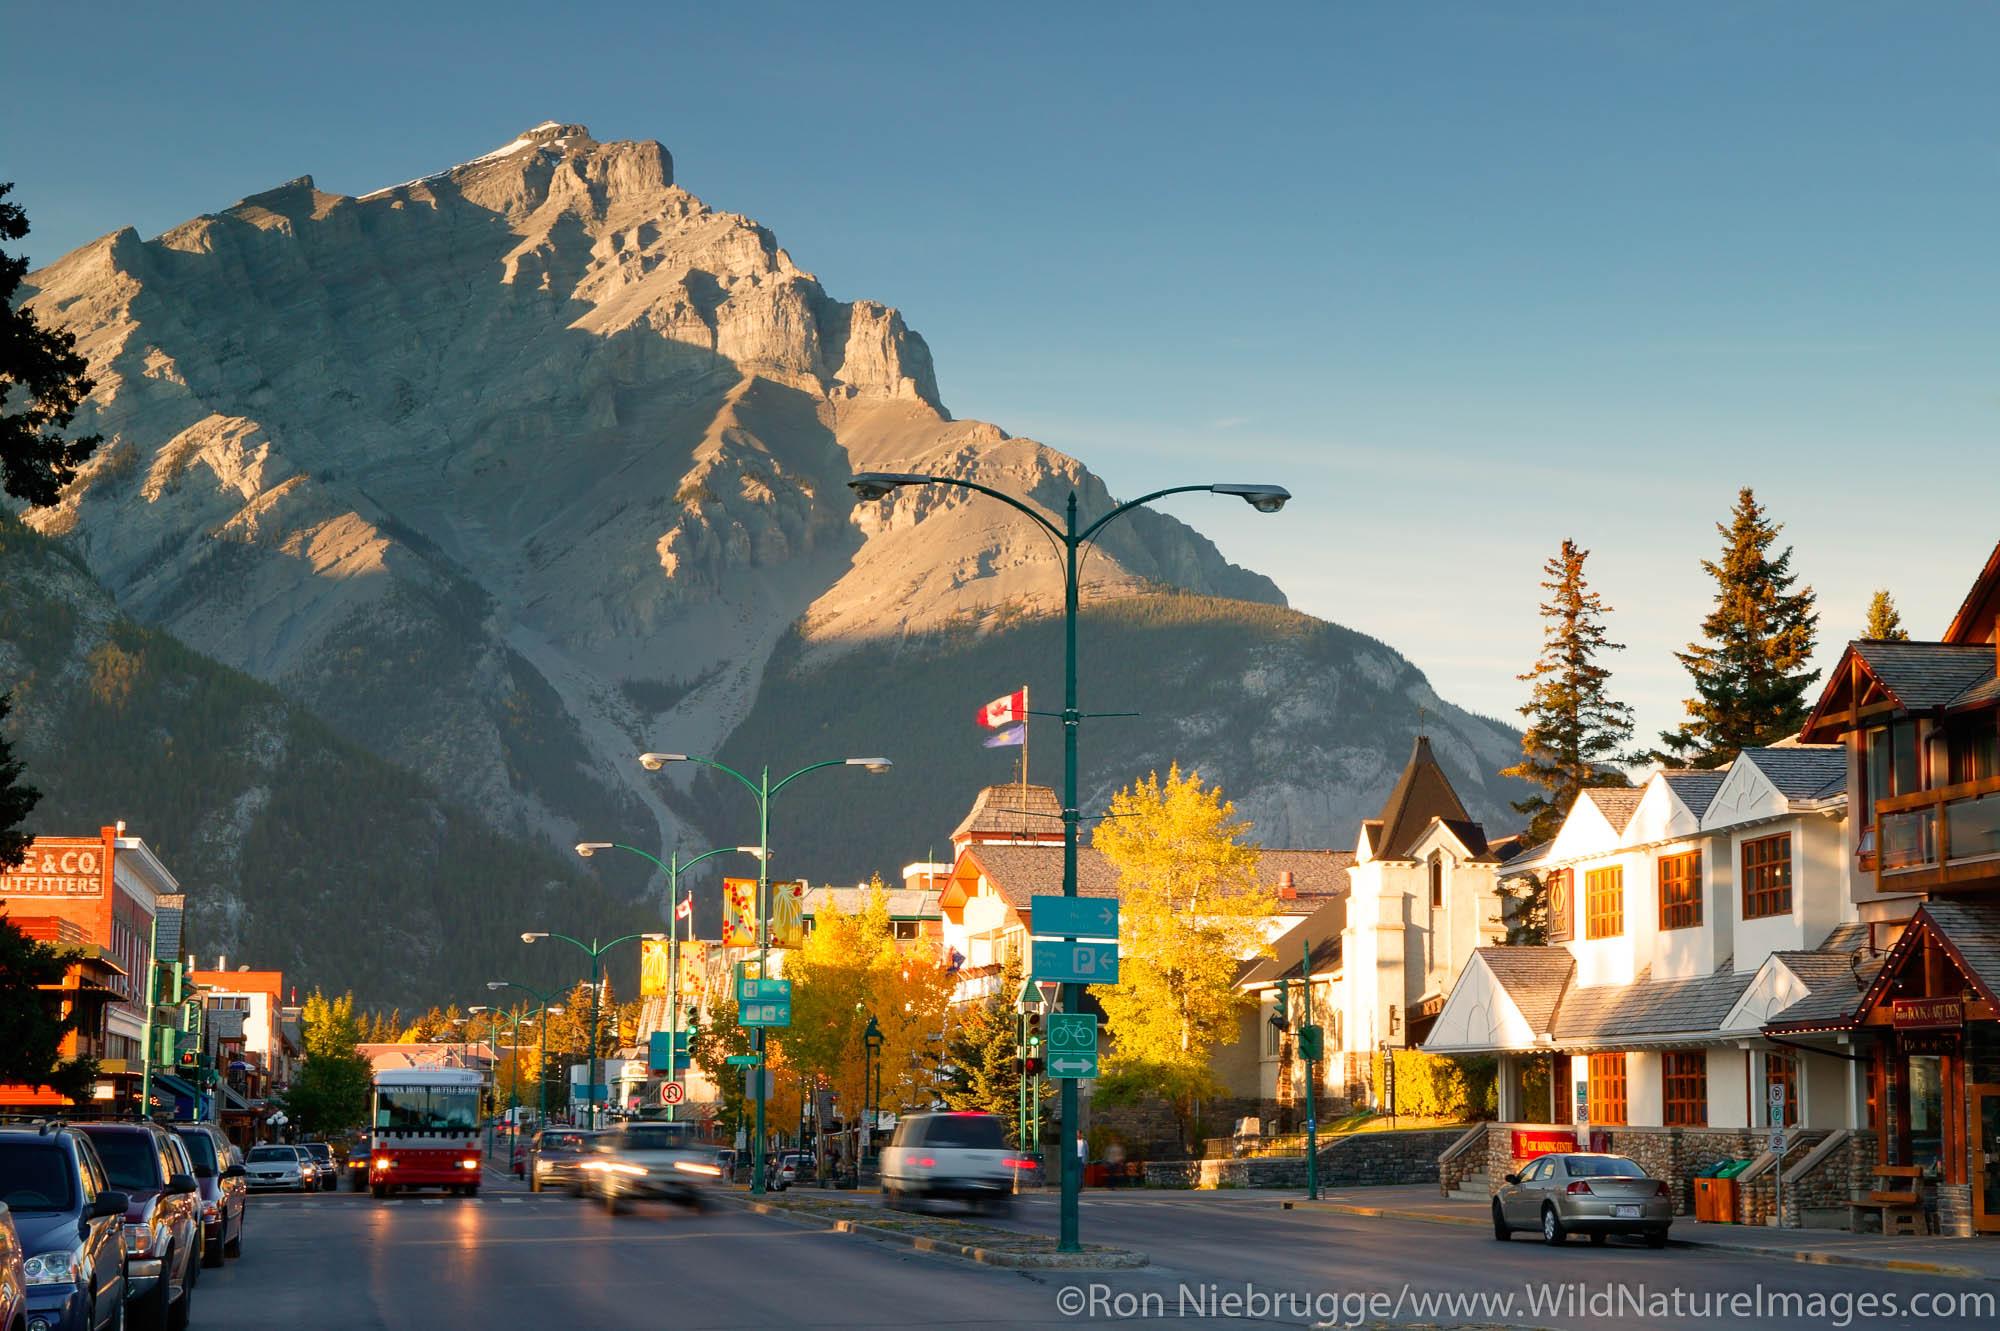 Banff and Cascade Mounatin (2,997 m) Banff National Park, Alberta, Canada.